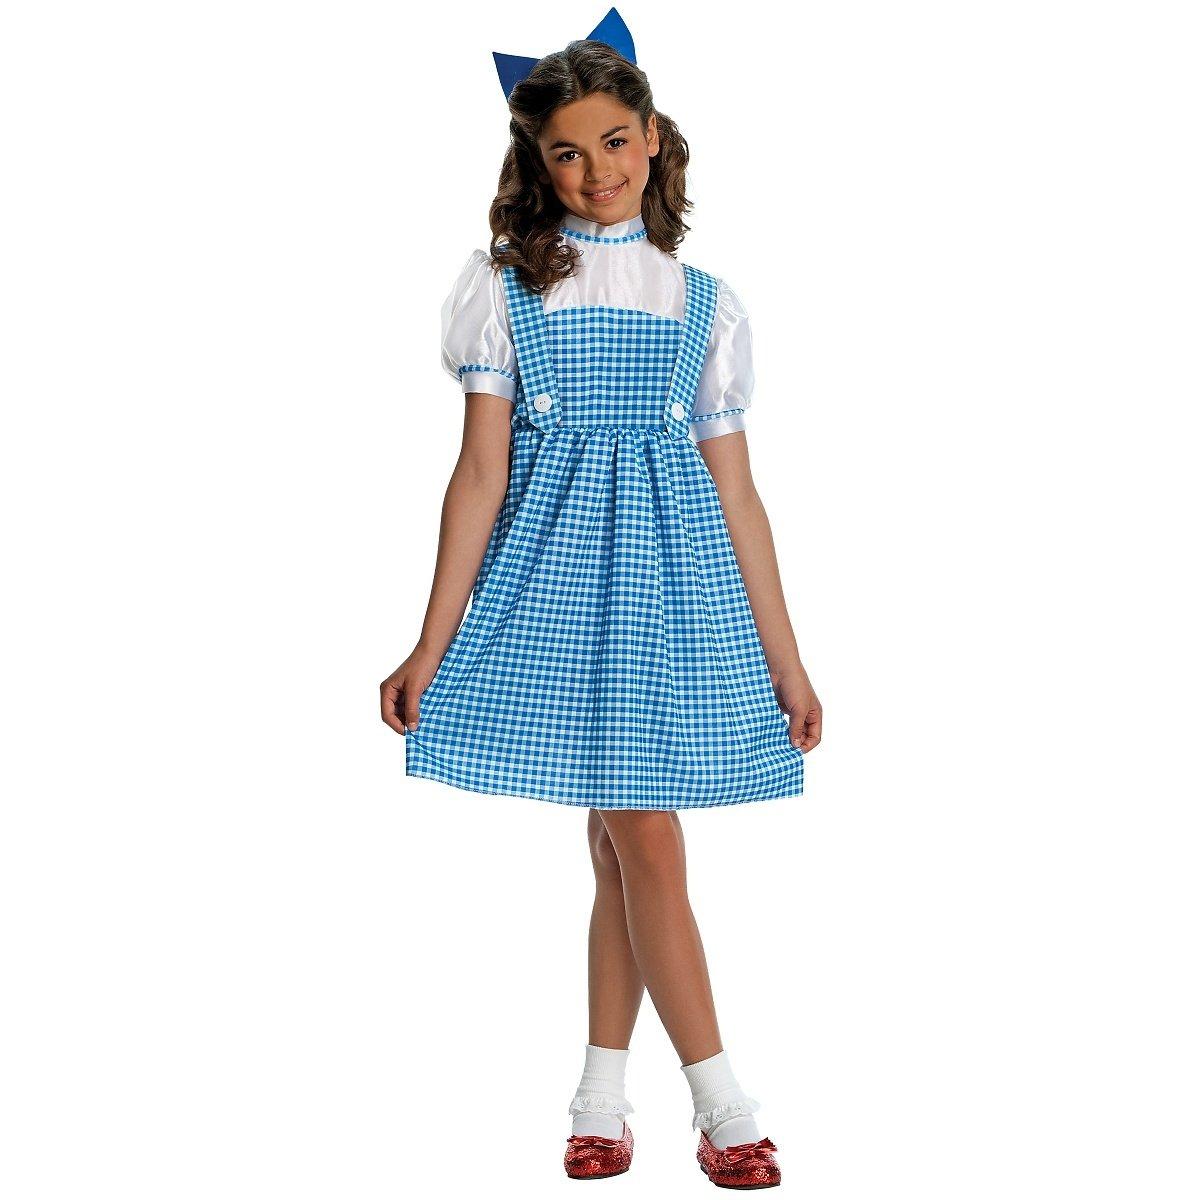 Amazon.com: Wizard of Oz Child's Deluxe Sequin Dorothy Costume ...